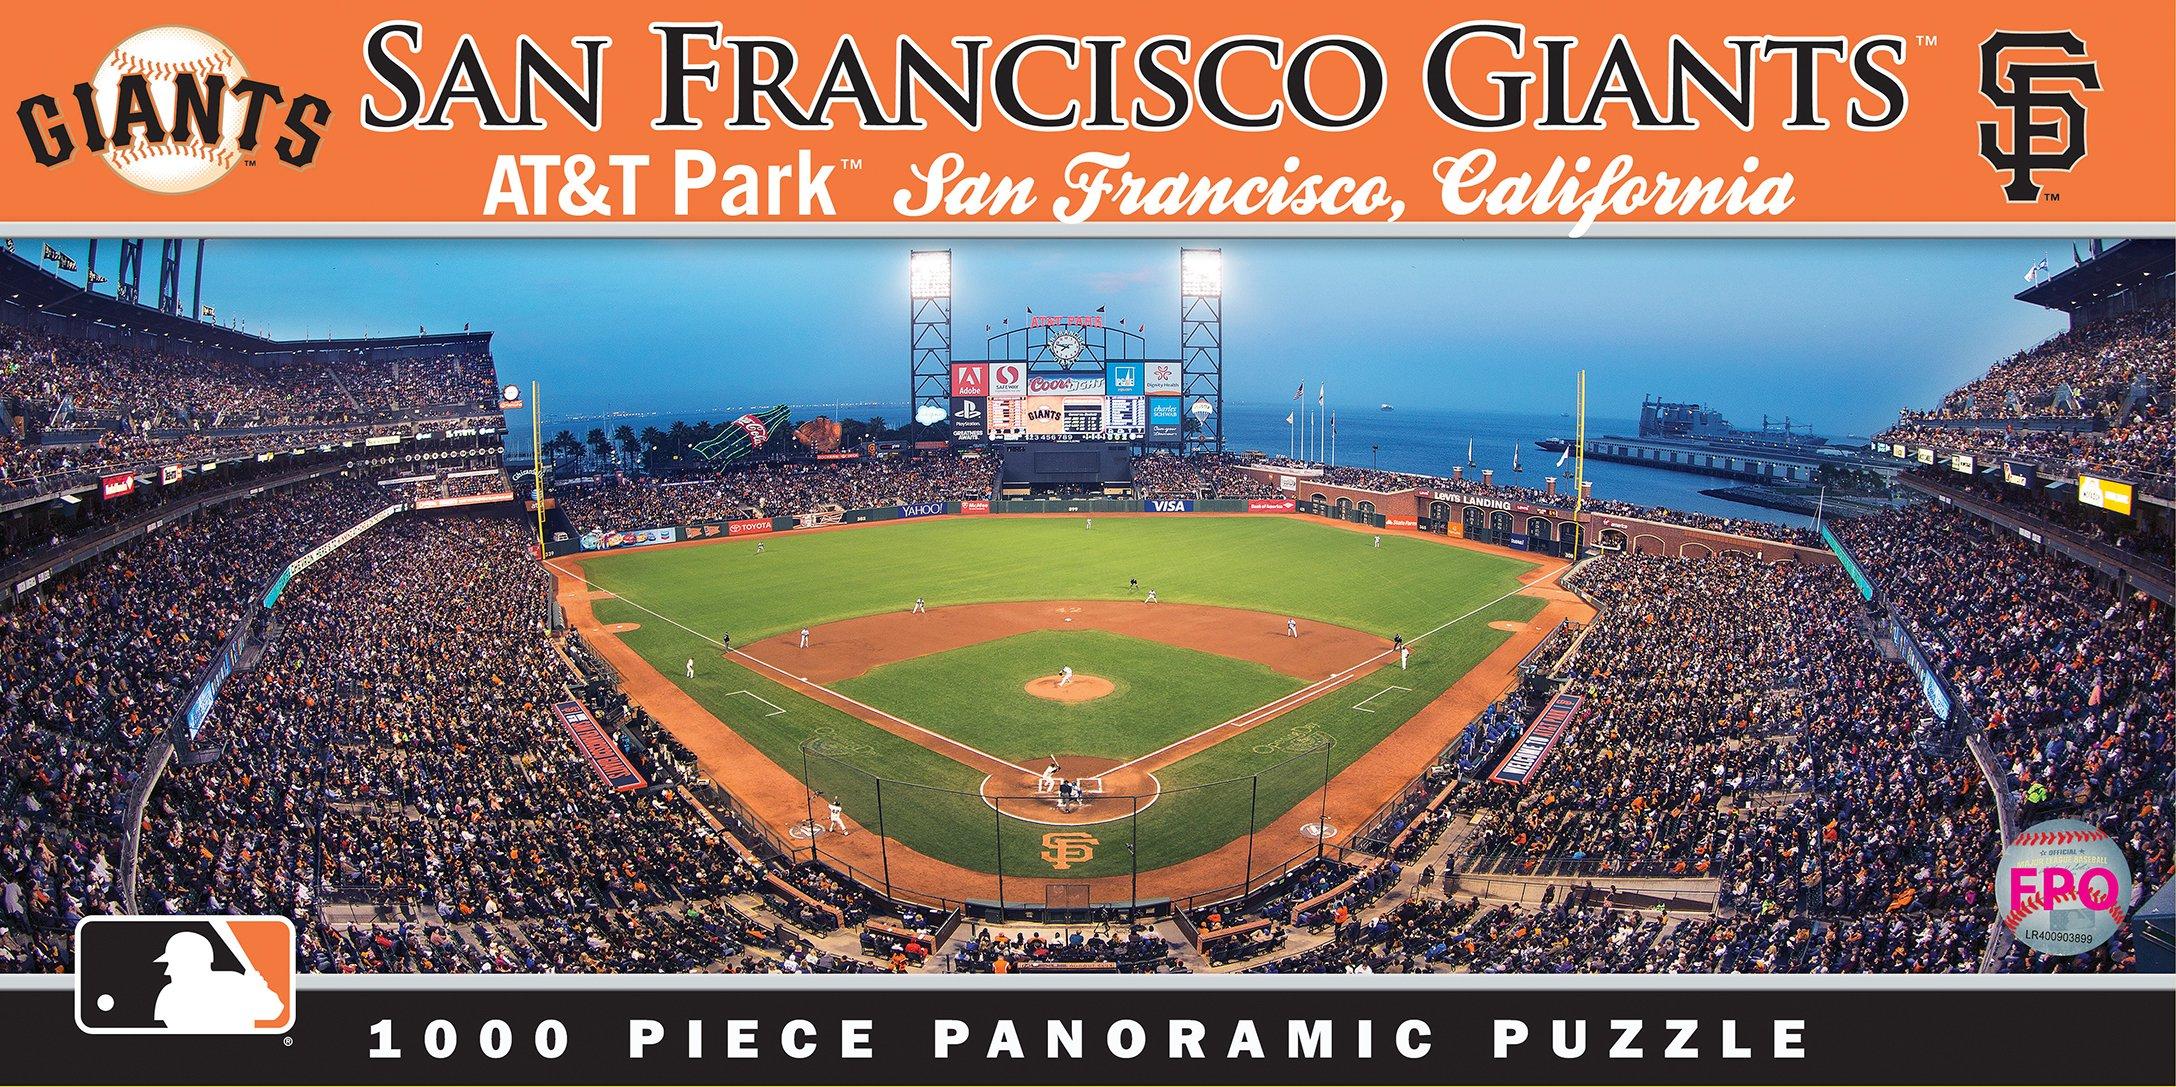 MasterPieces MLB San Francisco Giants Stadium Panoramic Jigsaw Puzzle, 1000-Piece